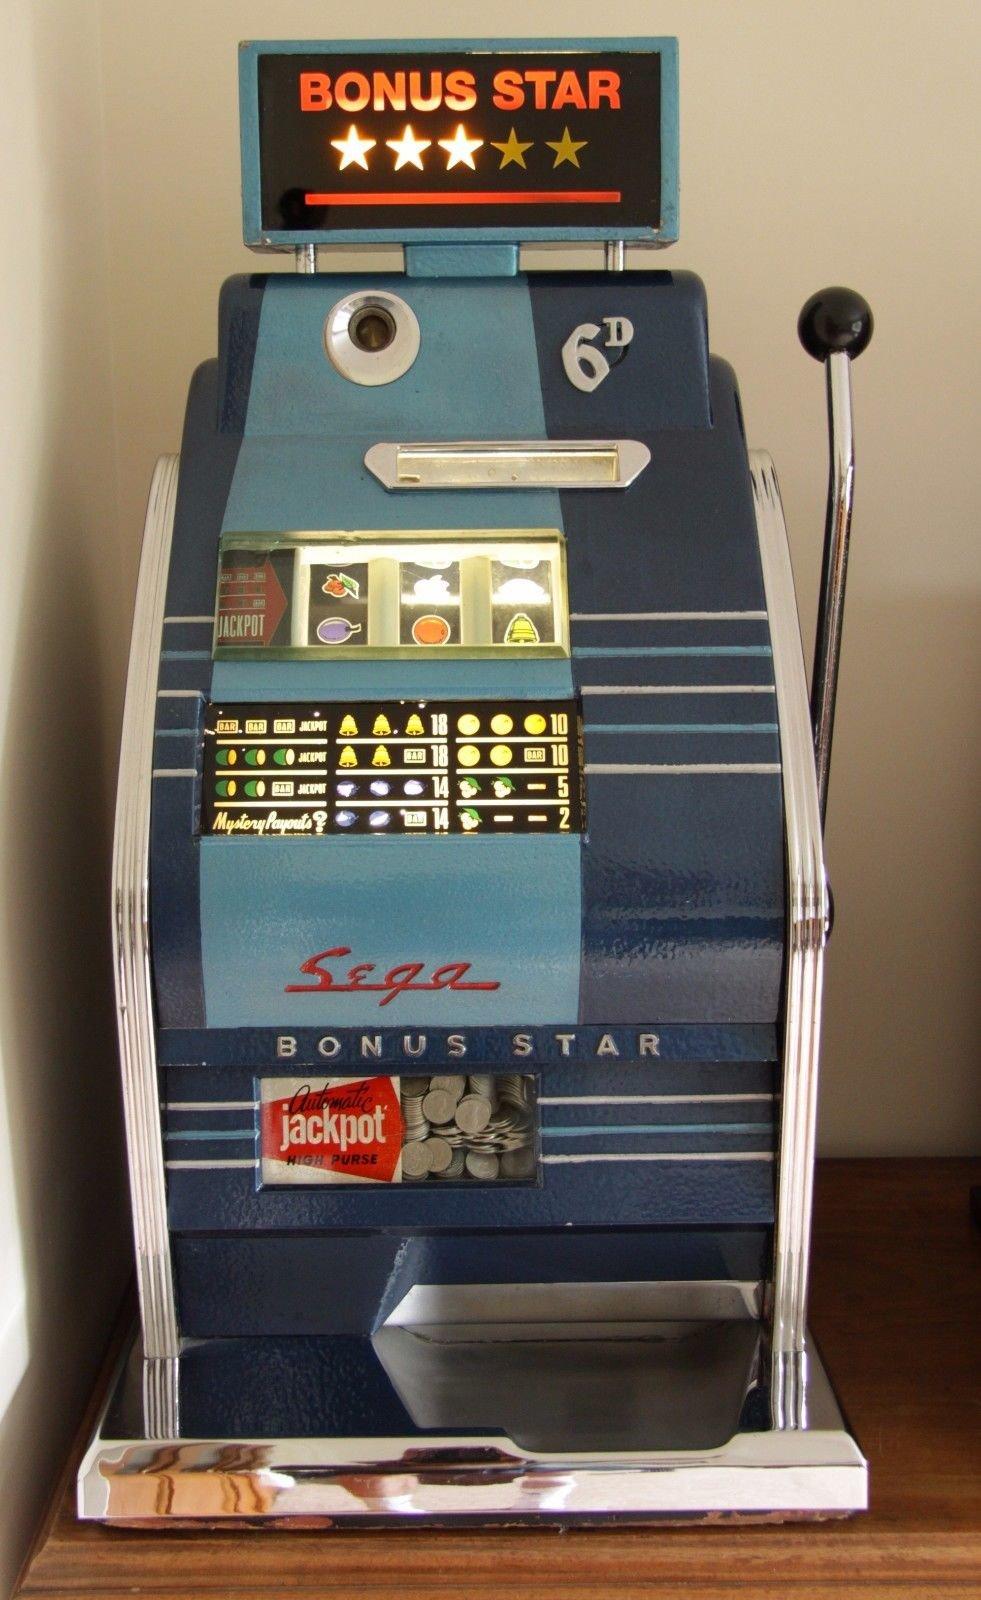 Sega slot machine for sale i dream of jeannie video slot machine for sale